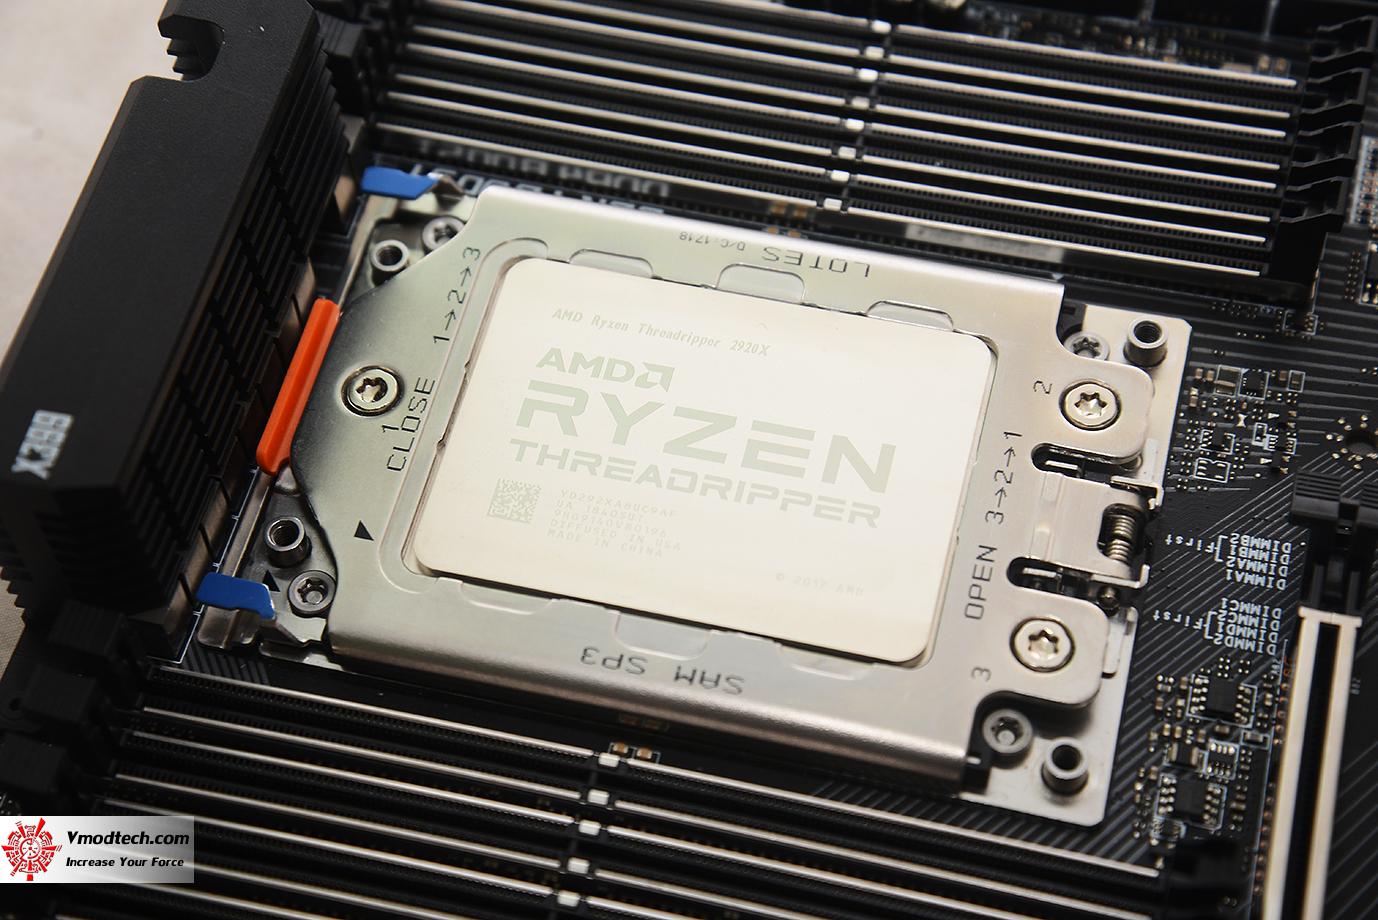 dsc 0563 AMD RYZEN THREADRIPPER 2920X PROCESSOR REVIEW